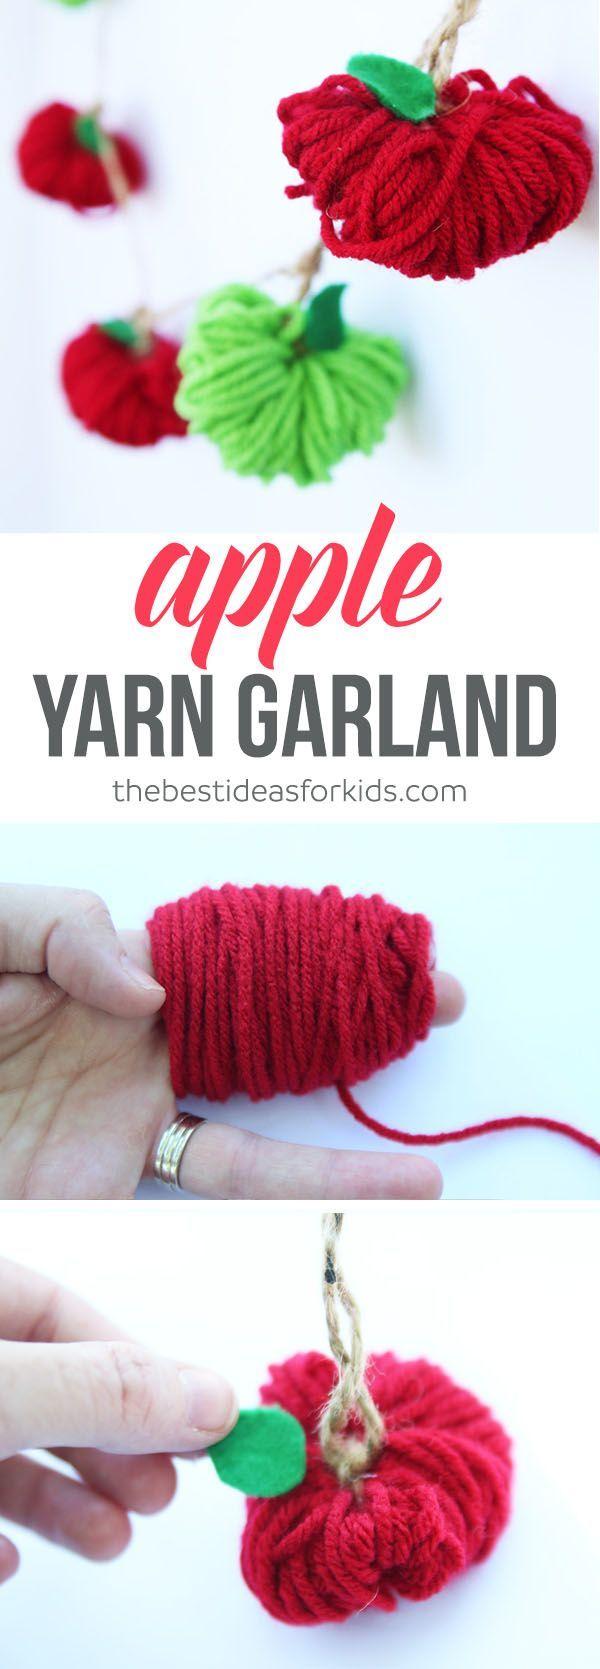 Apple garland, yarn garland, yarn craft, teacehr gift, apple craft, #school #tea...